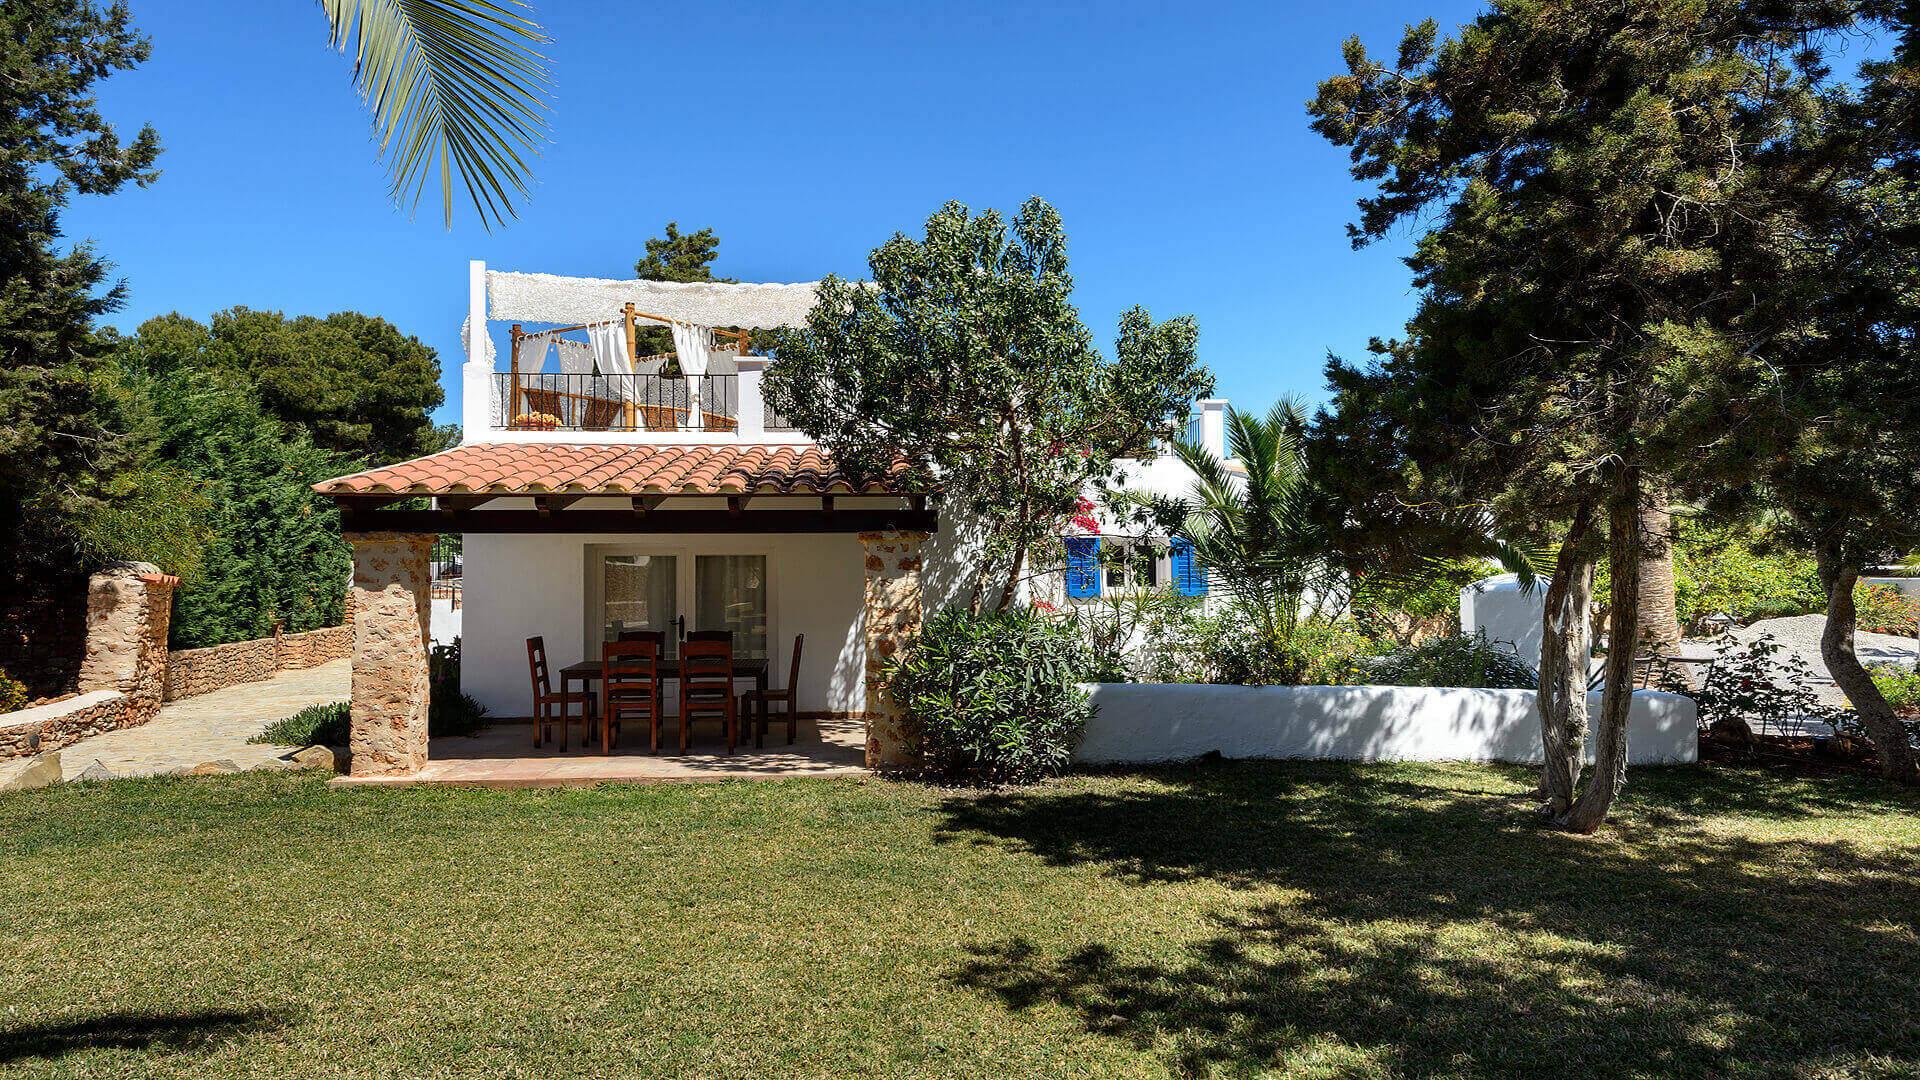 Villa Cigala Ibiza 21 Bungalow